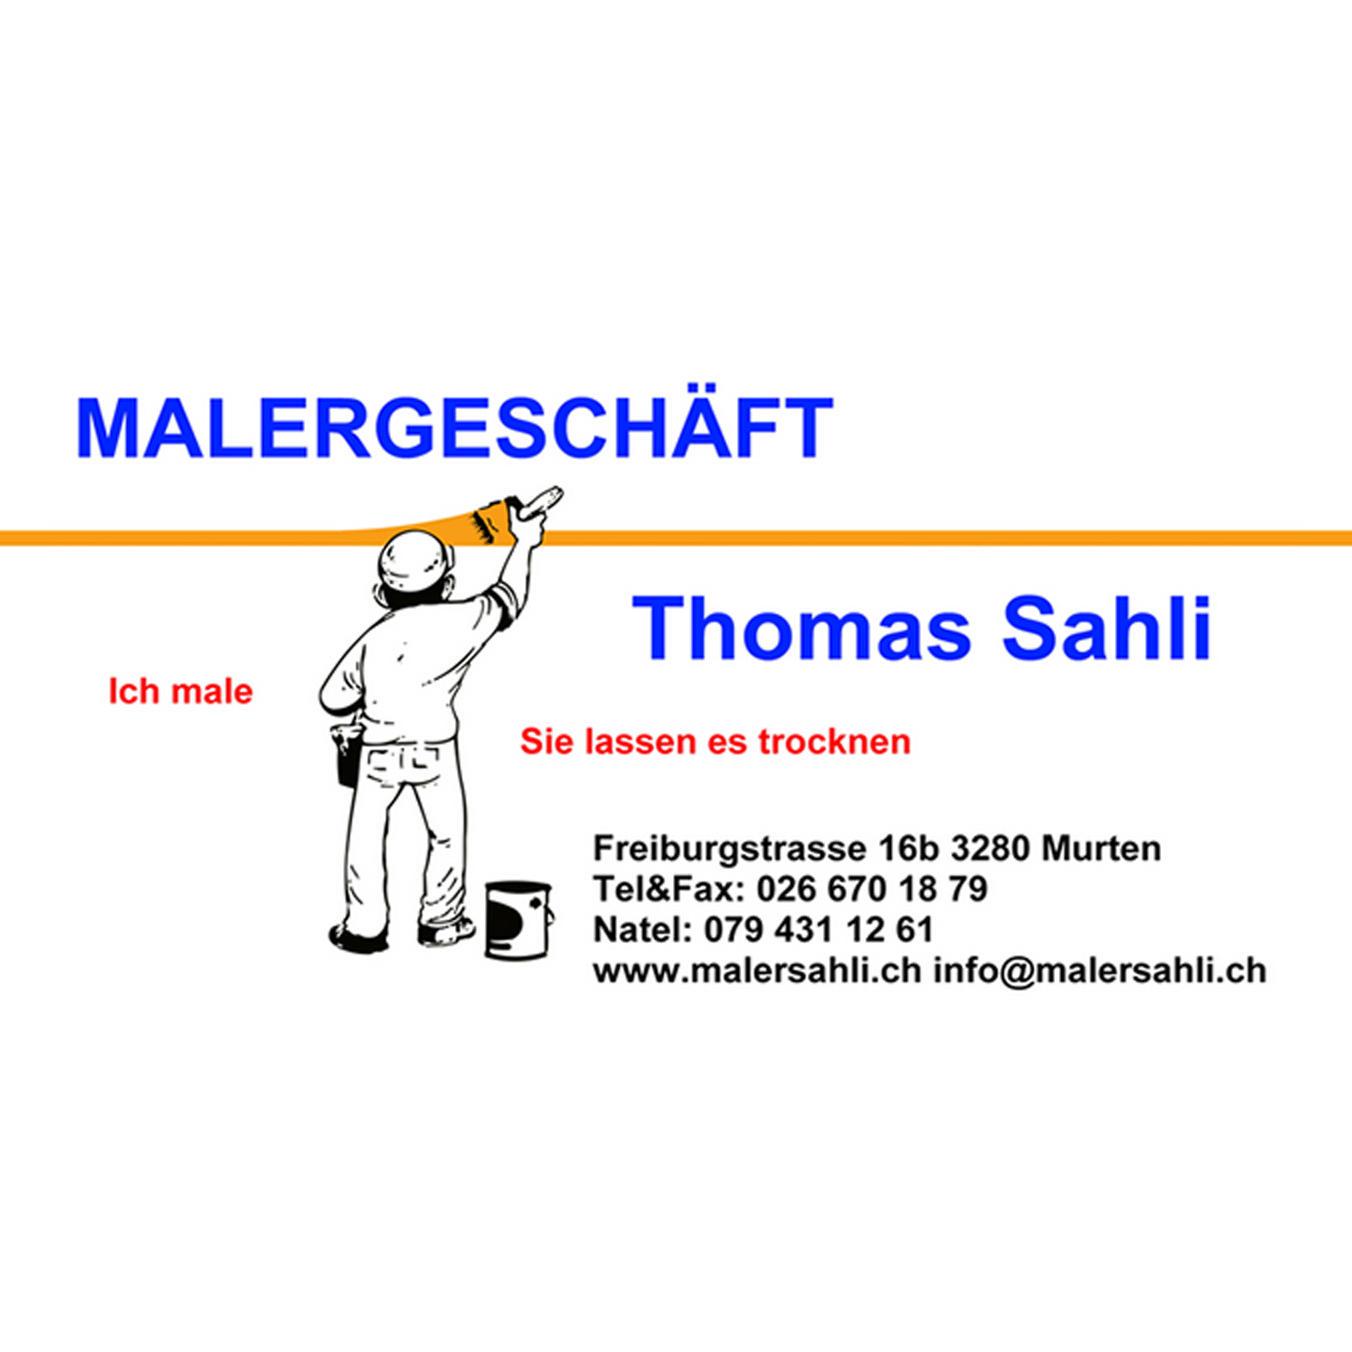 Thomas Sahli Malergeschäft